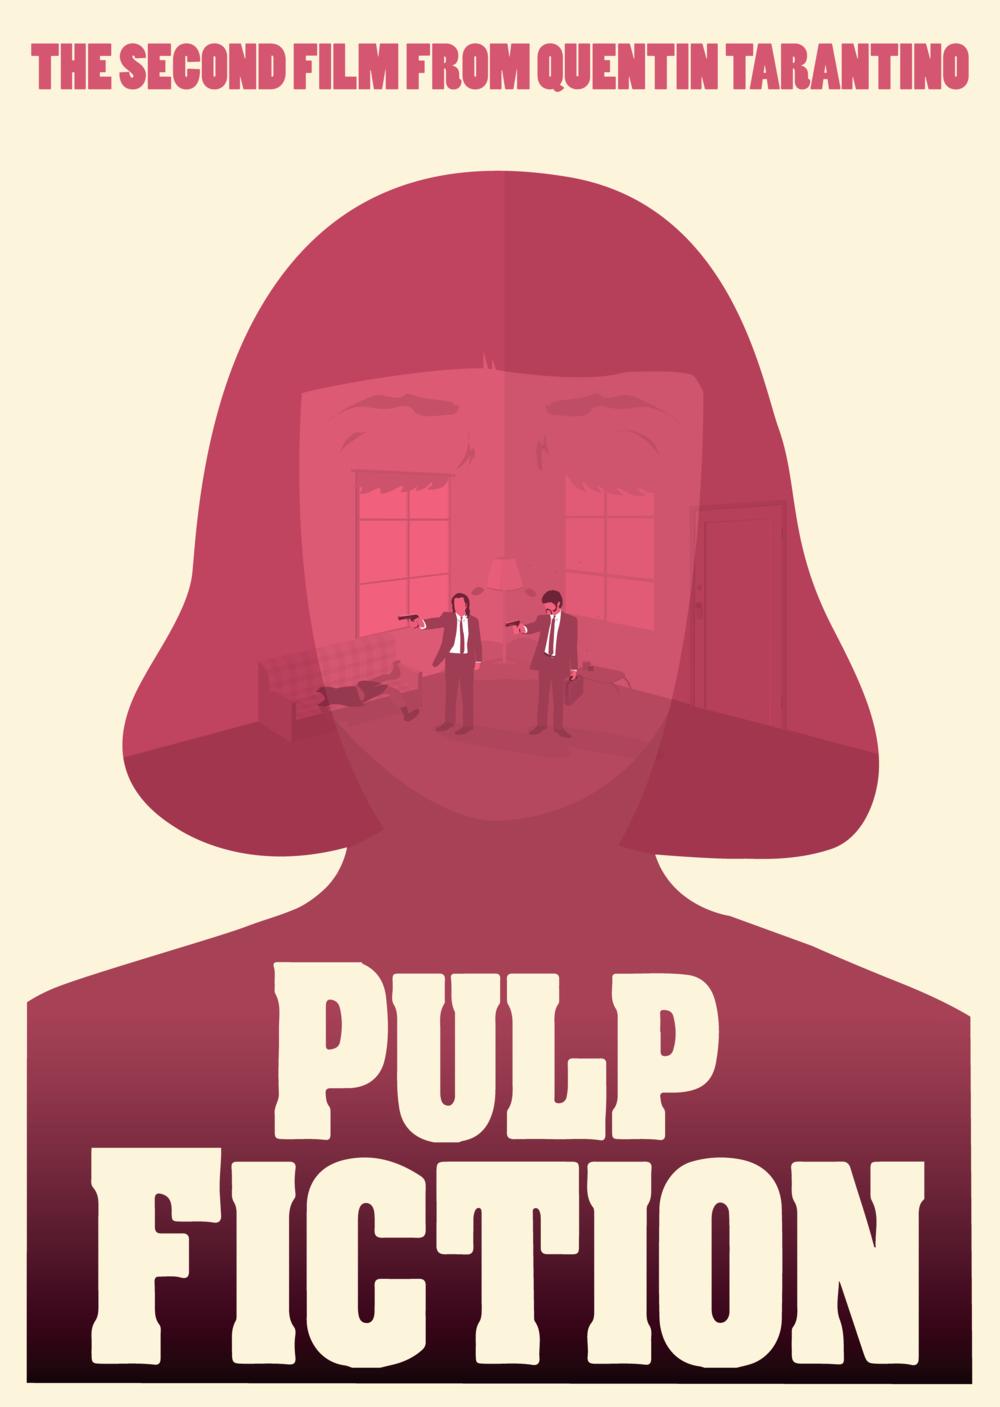 Pulp Fiction - Apartment-02.png